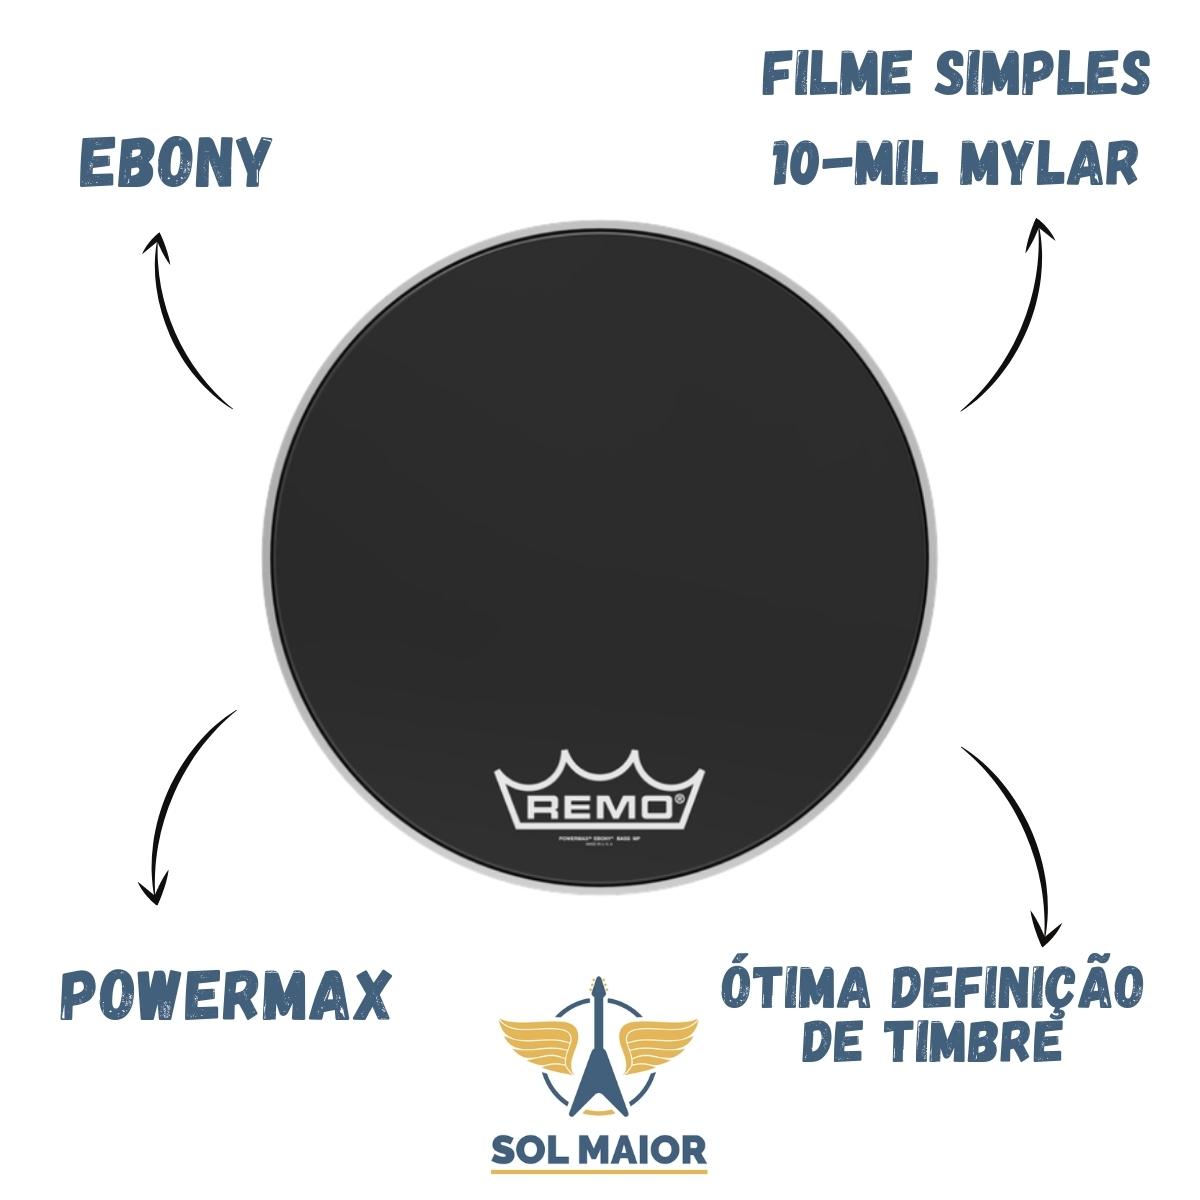 "Pele Remo Bumbo Marcial 16"" Powermax Ebony PM-1416-MP"